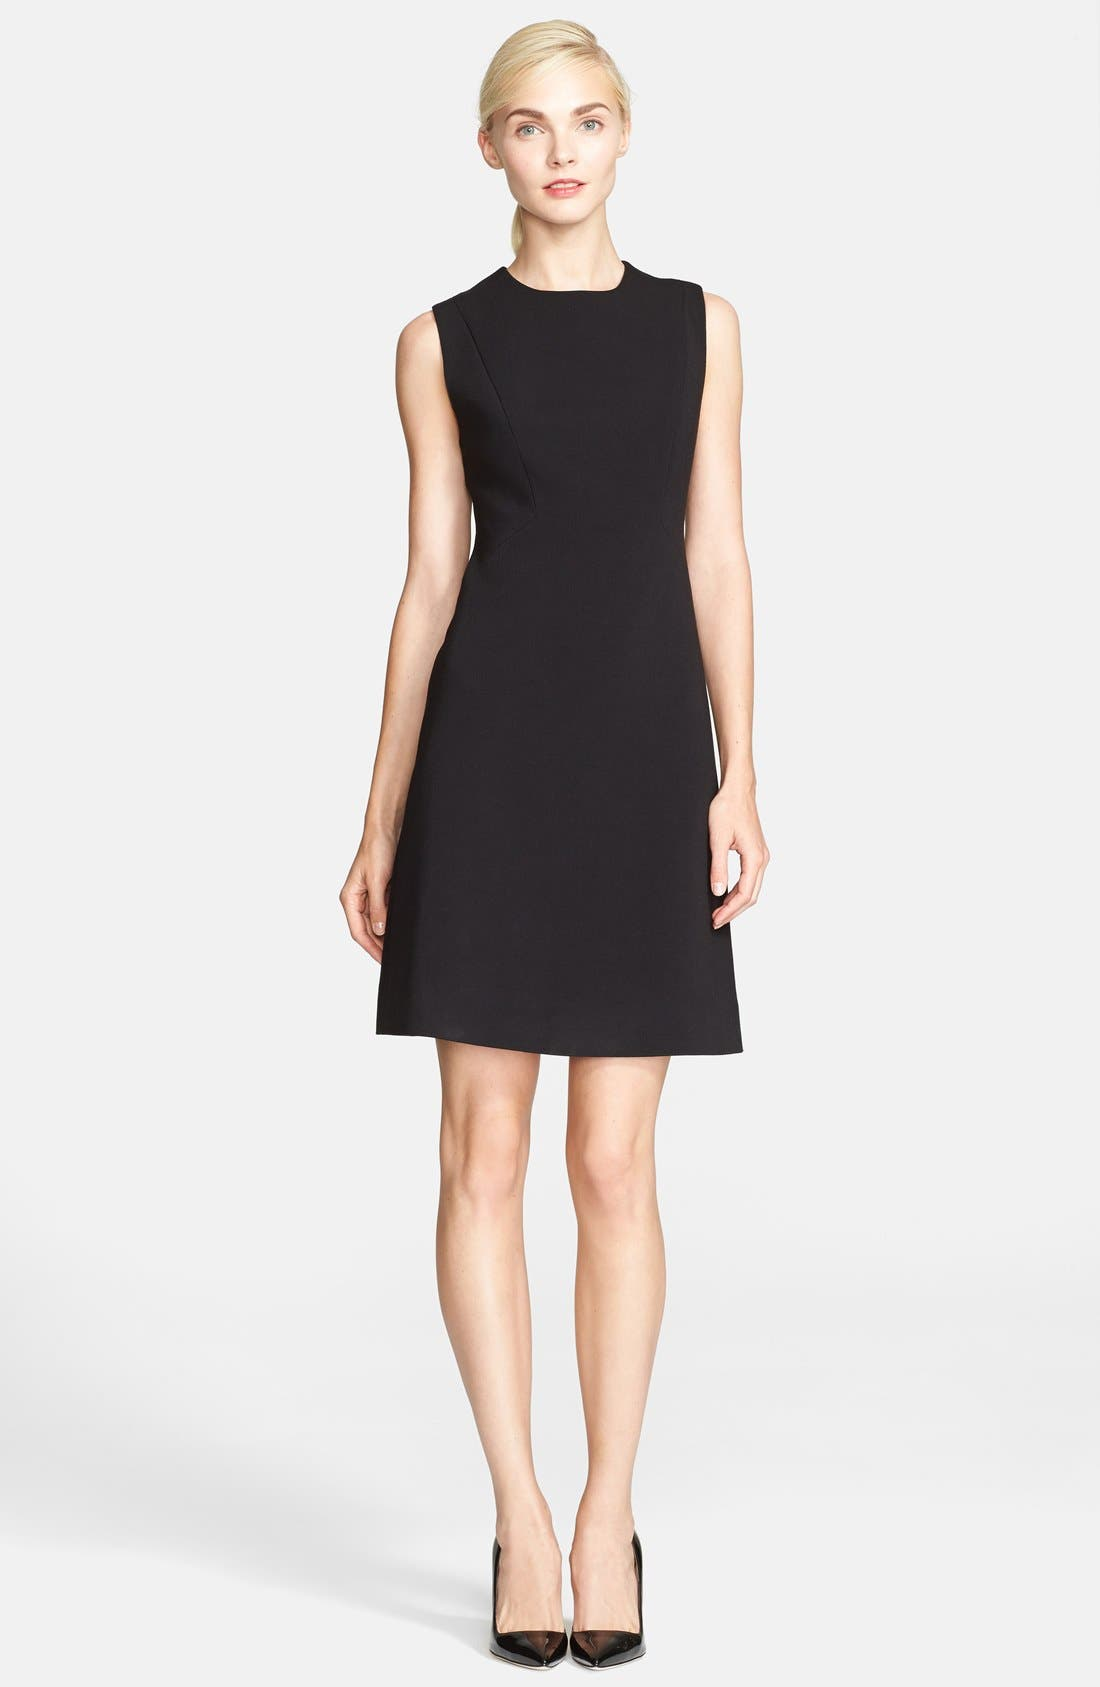 Alternate Image 1 Selected - kate spade new york 'sicily' sheath dress